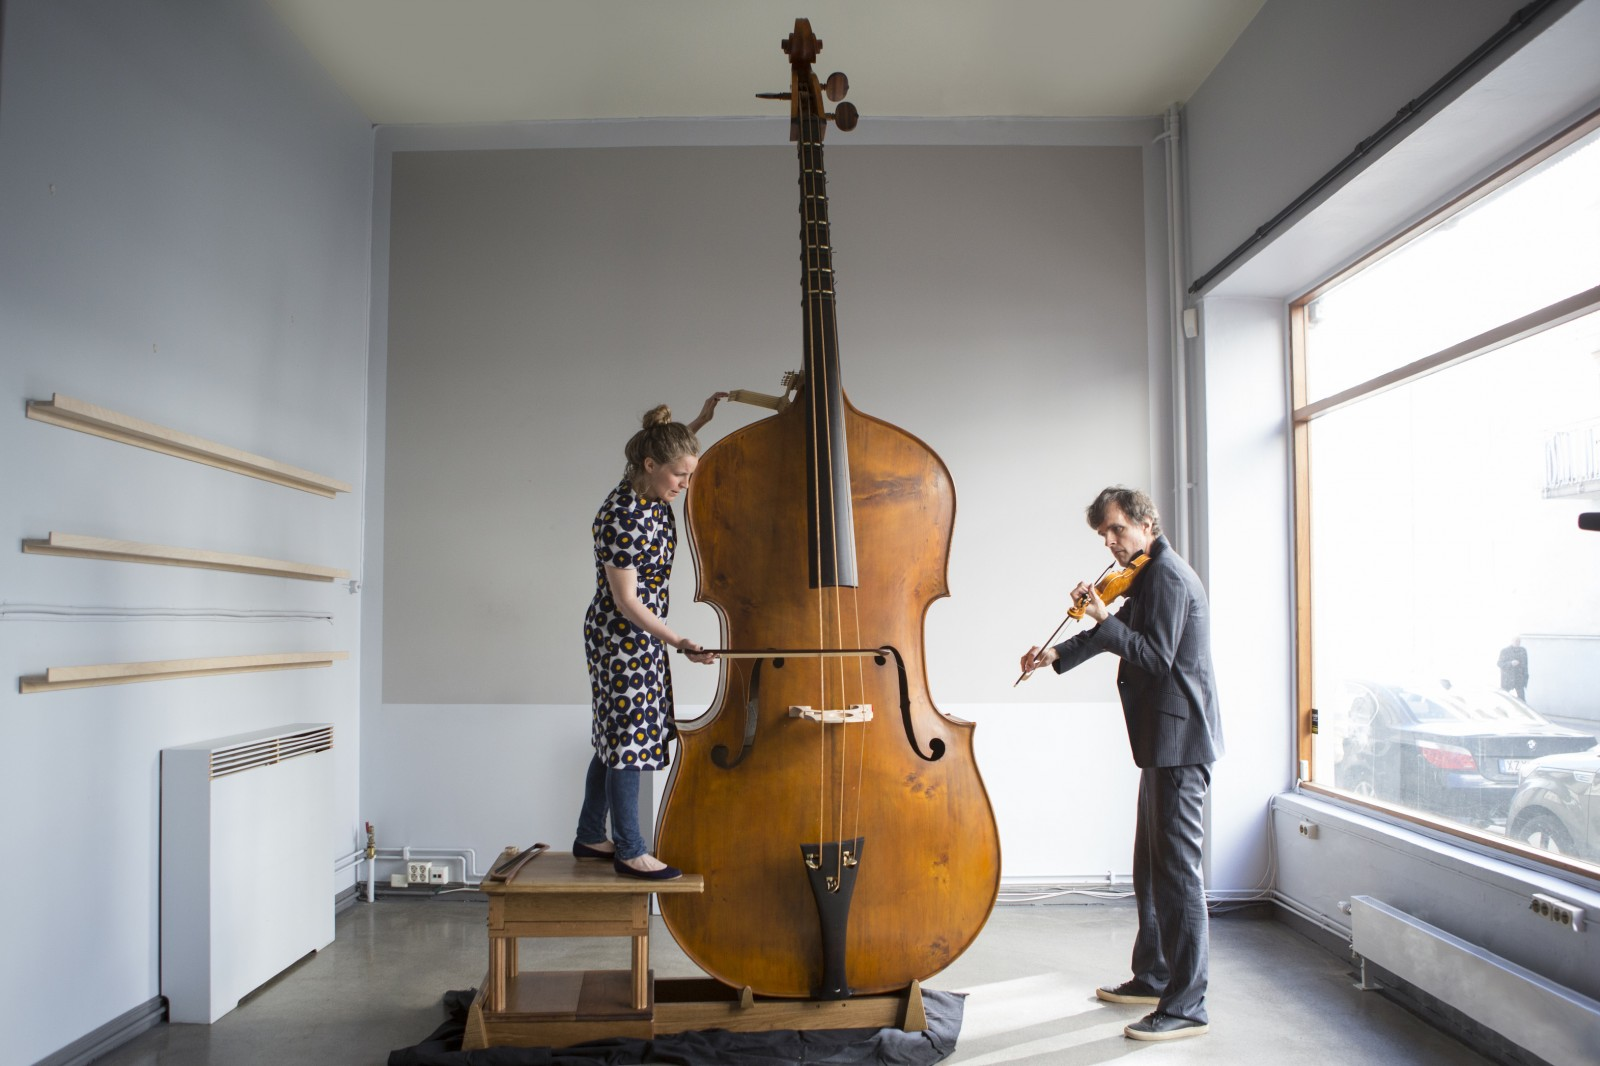 Tutte le foto sono di Henrik Beck / nymusikk.no - Octobass